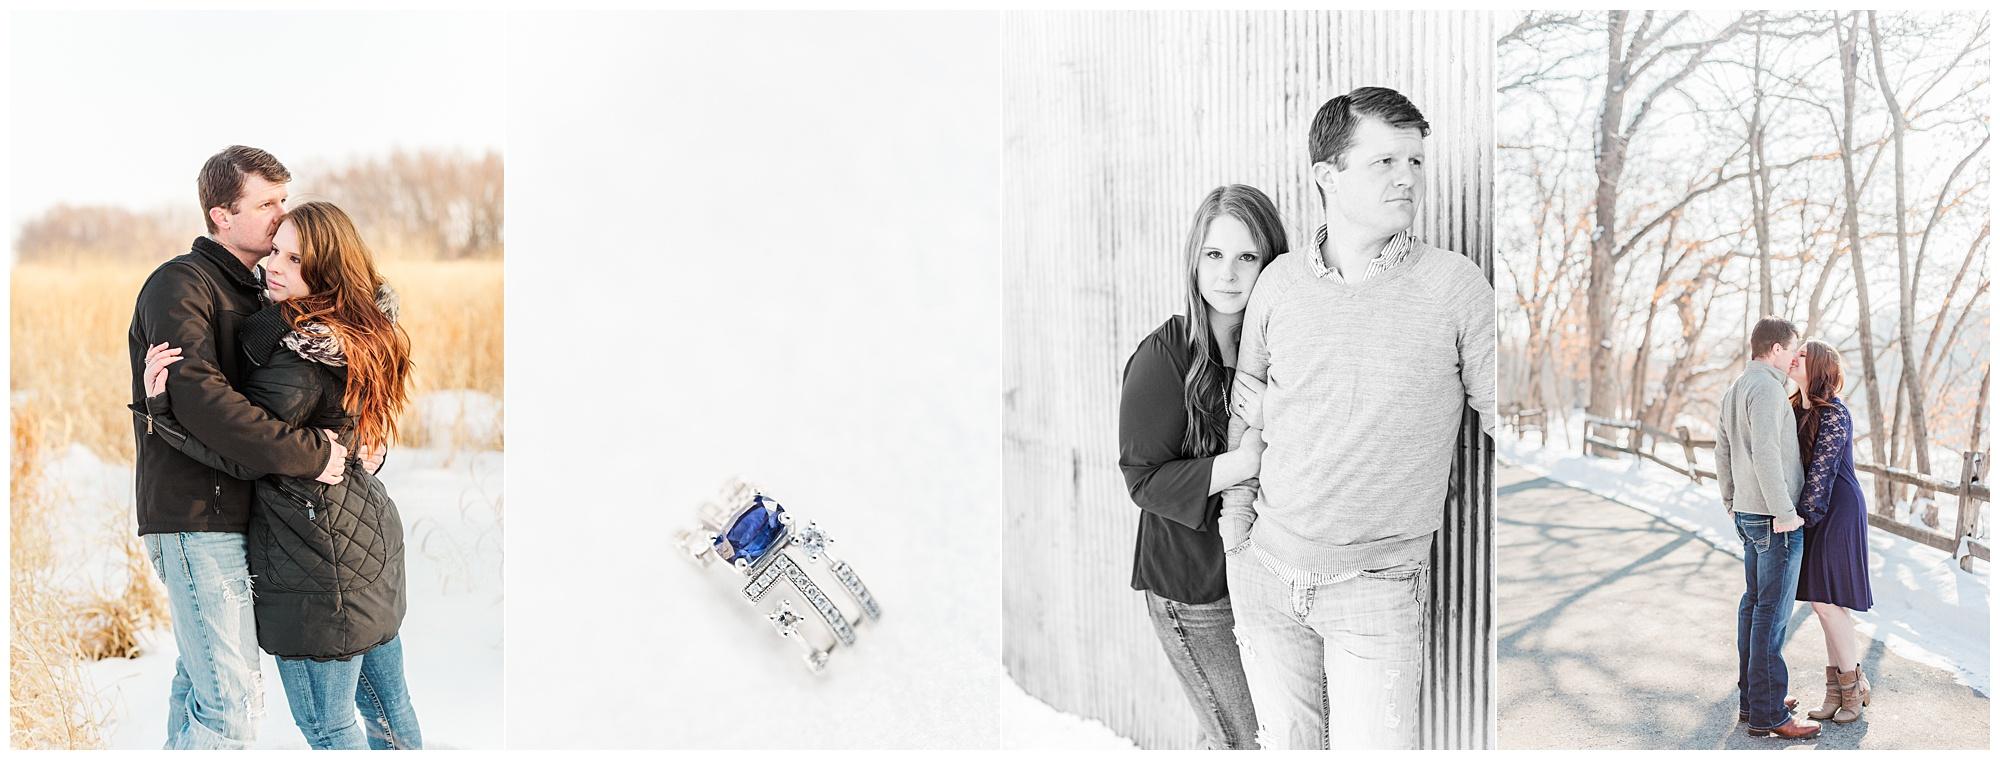 Hannah + Chris | Engaged